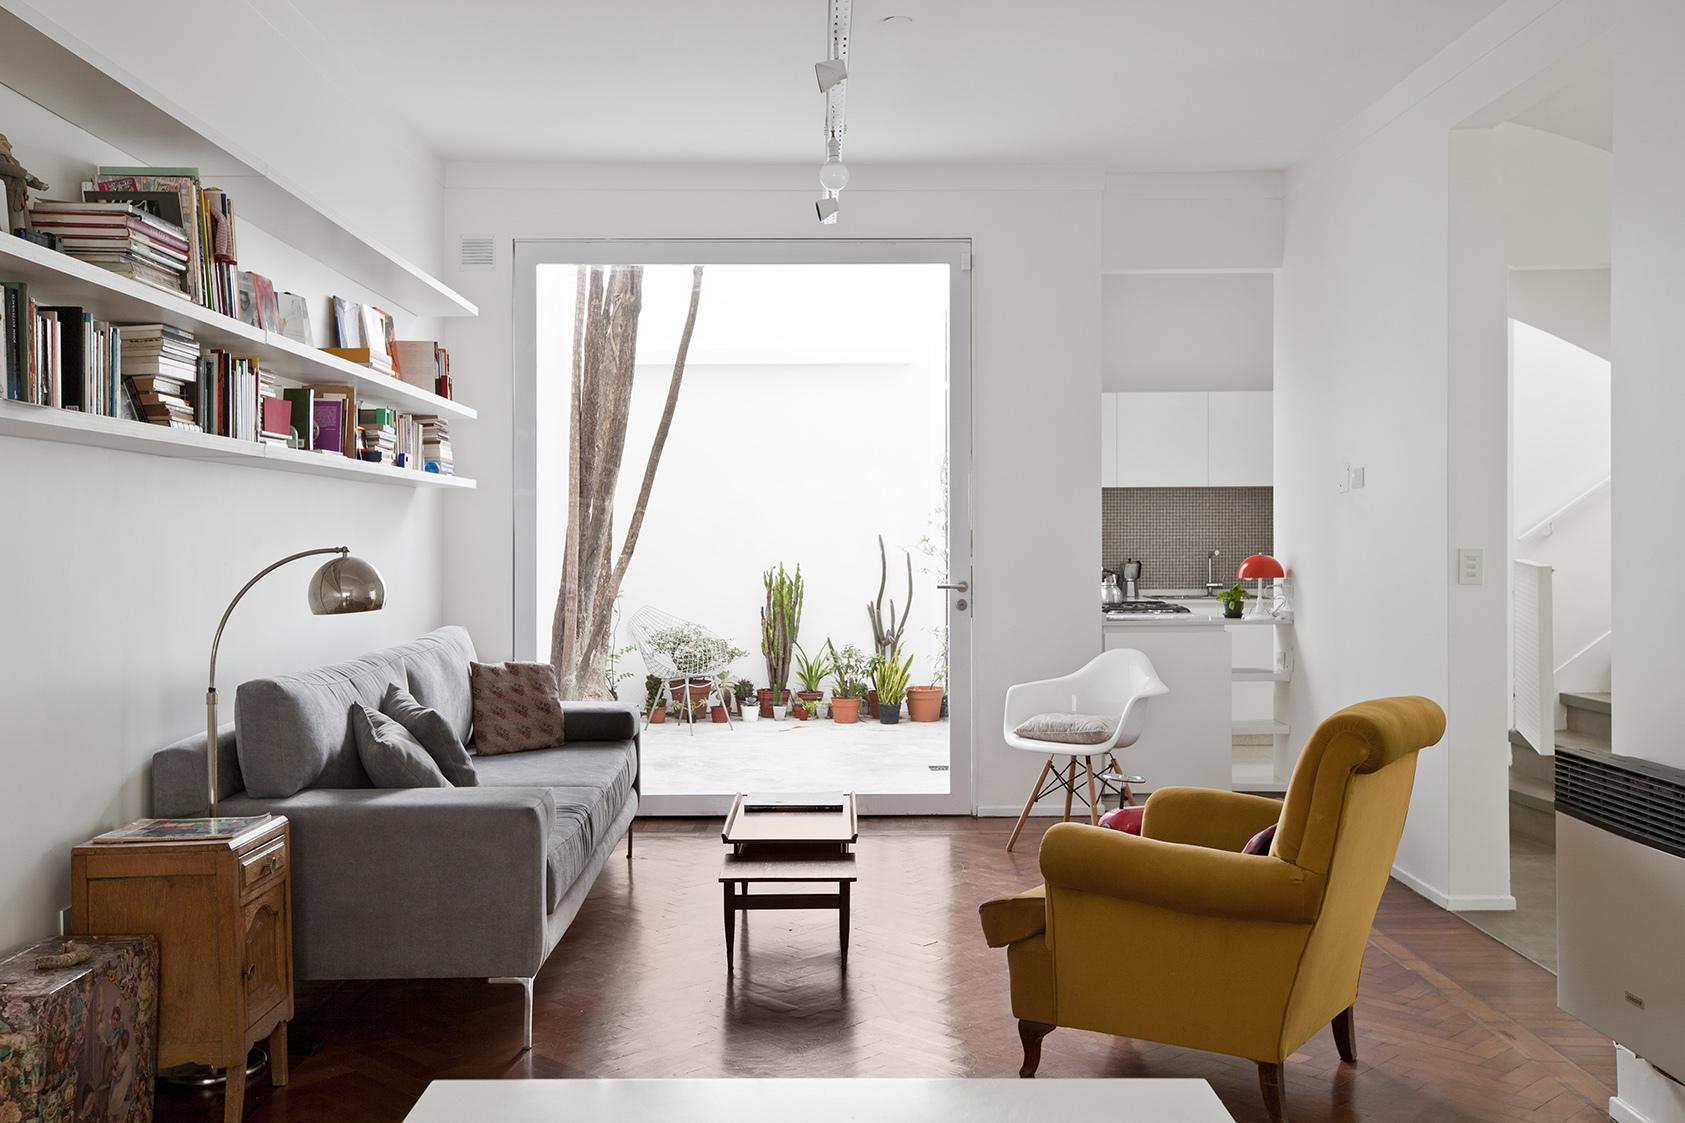 PH Olazabal / Ignacio Szulman arquitecto